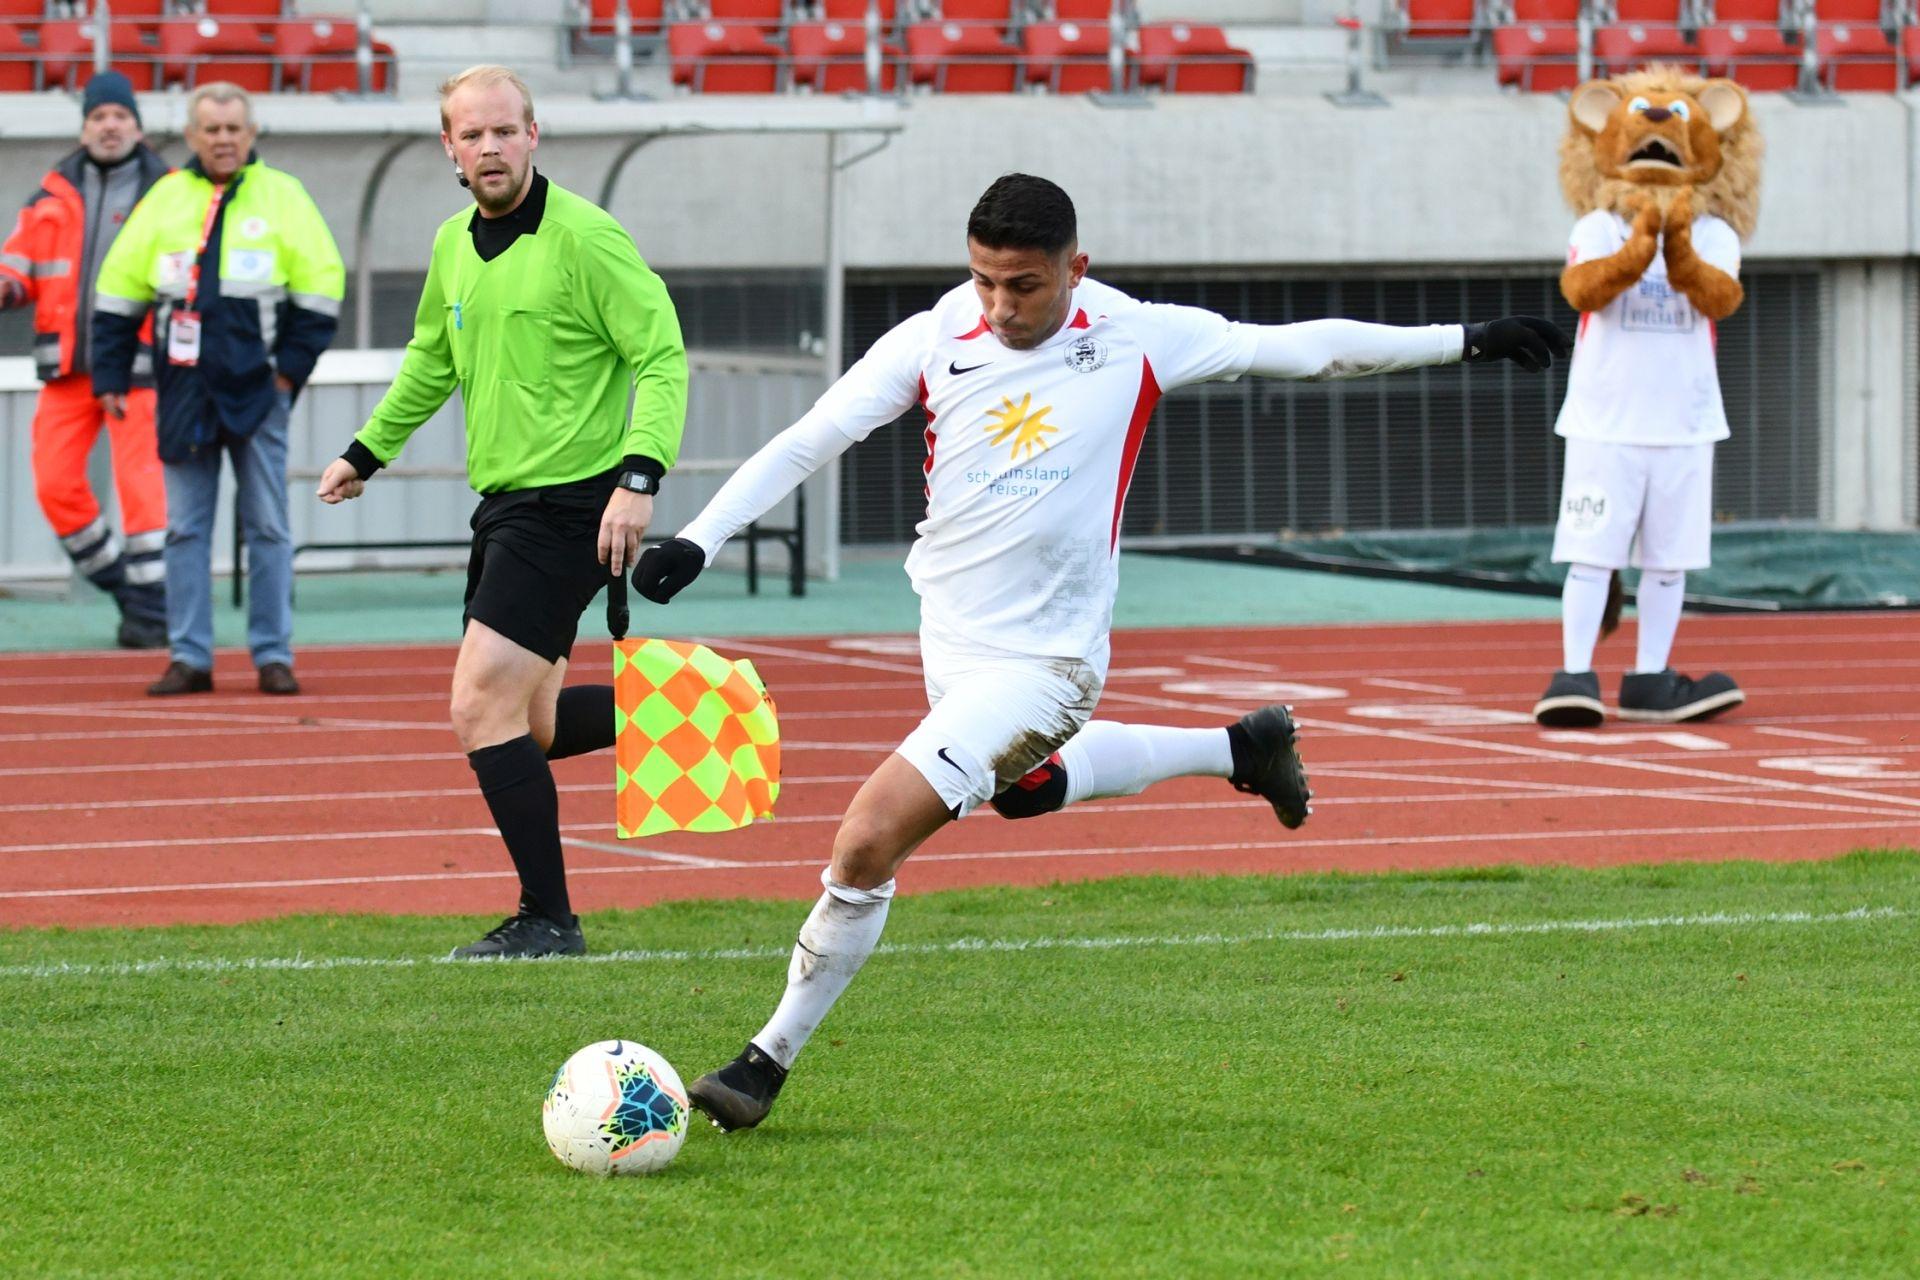 Lotto Hessenliga 2019/2020, KSV Hessen Kassel, SC Waldgirmes, Endstand 4:1, Nael Najjar (KSV Hessen Kassel)